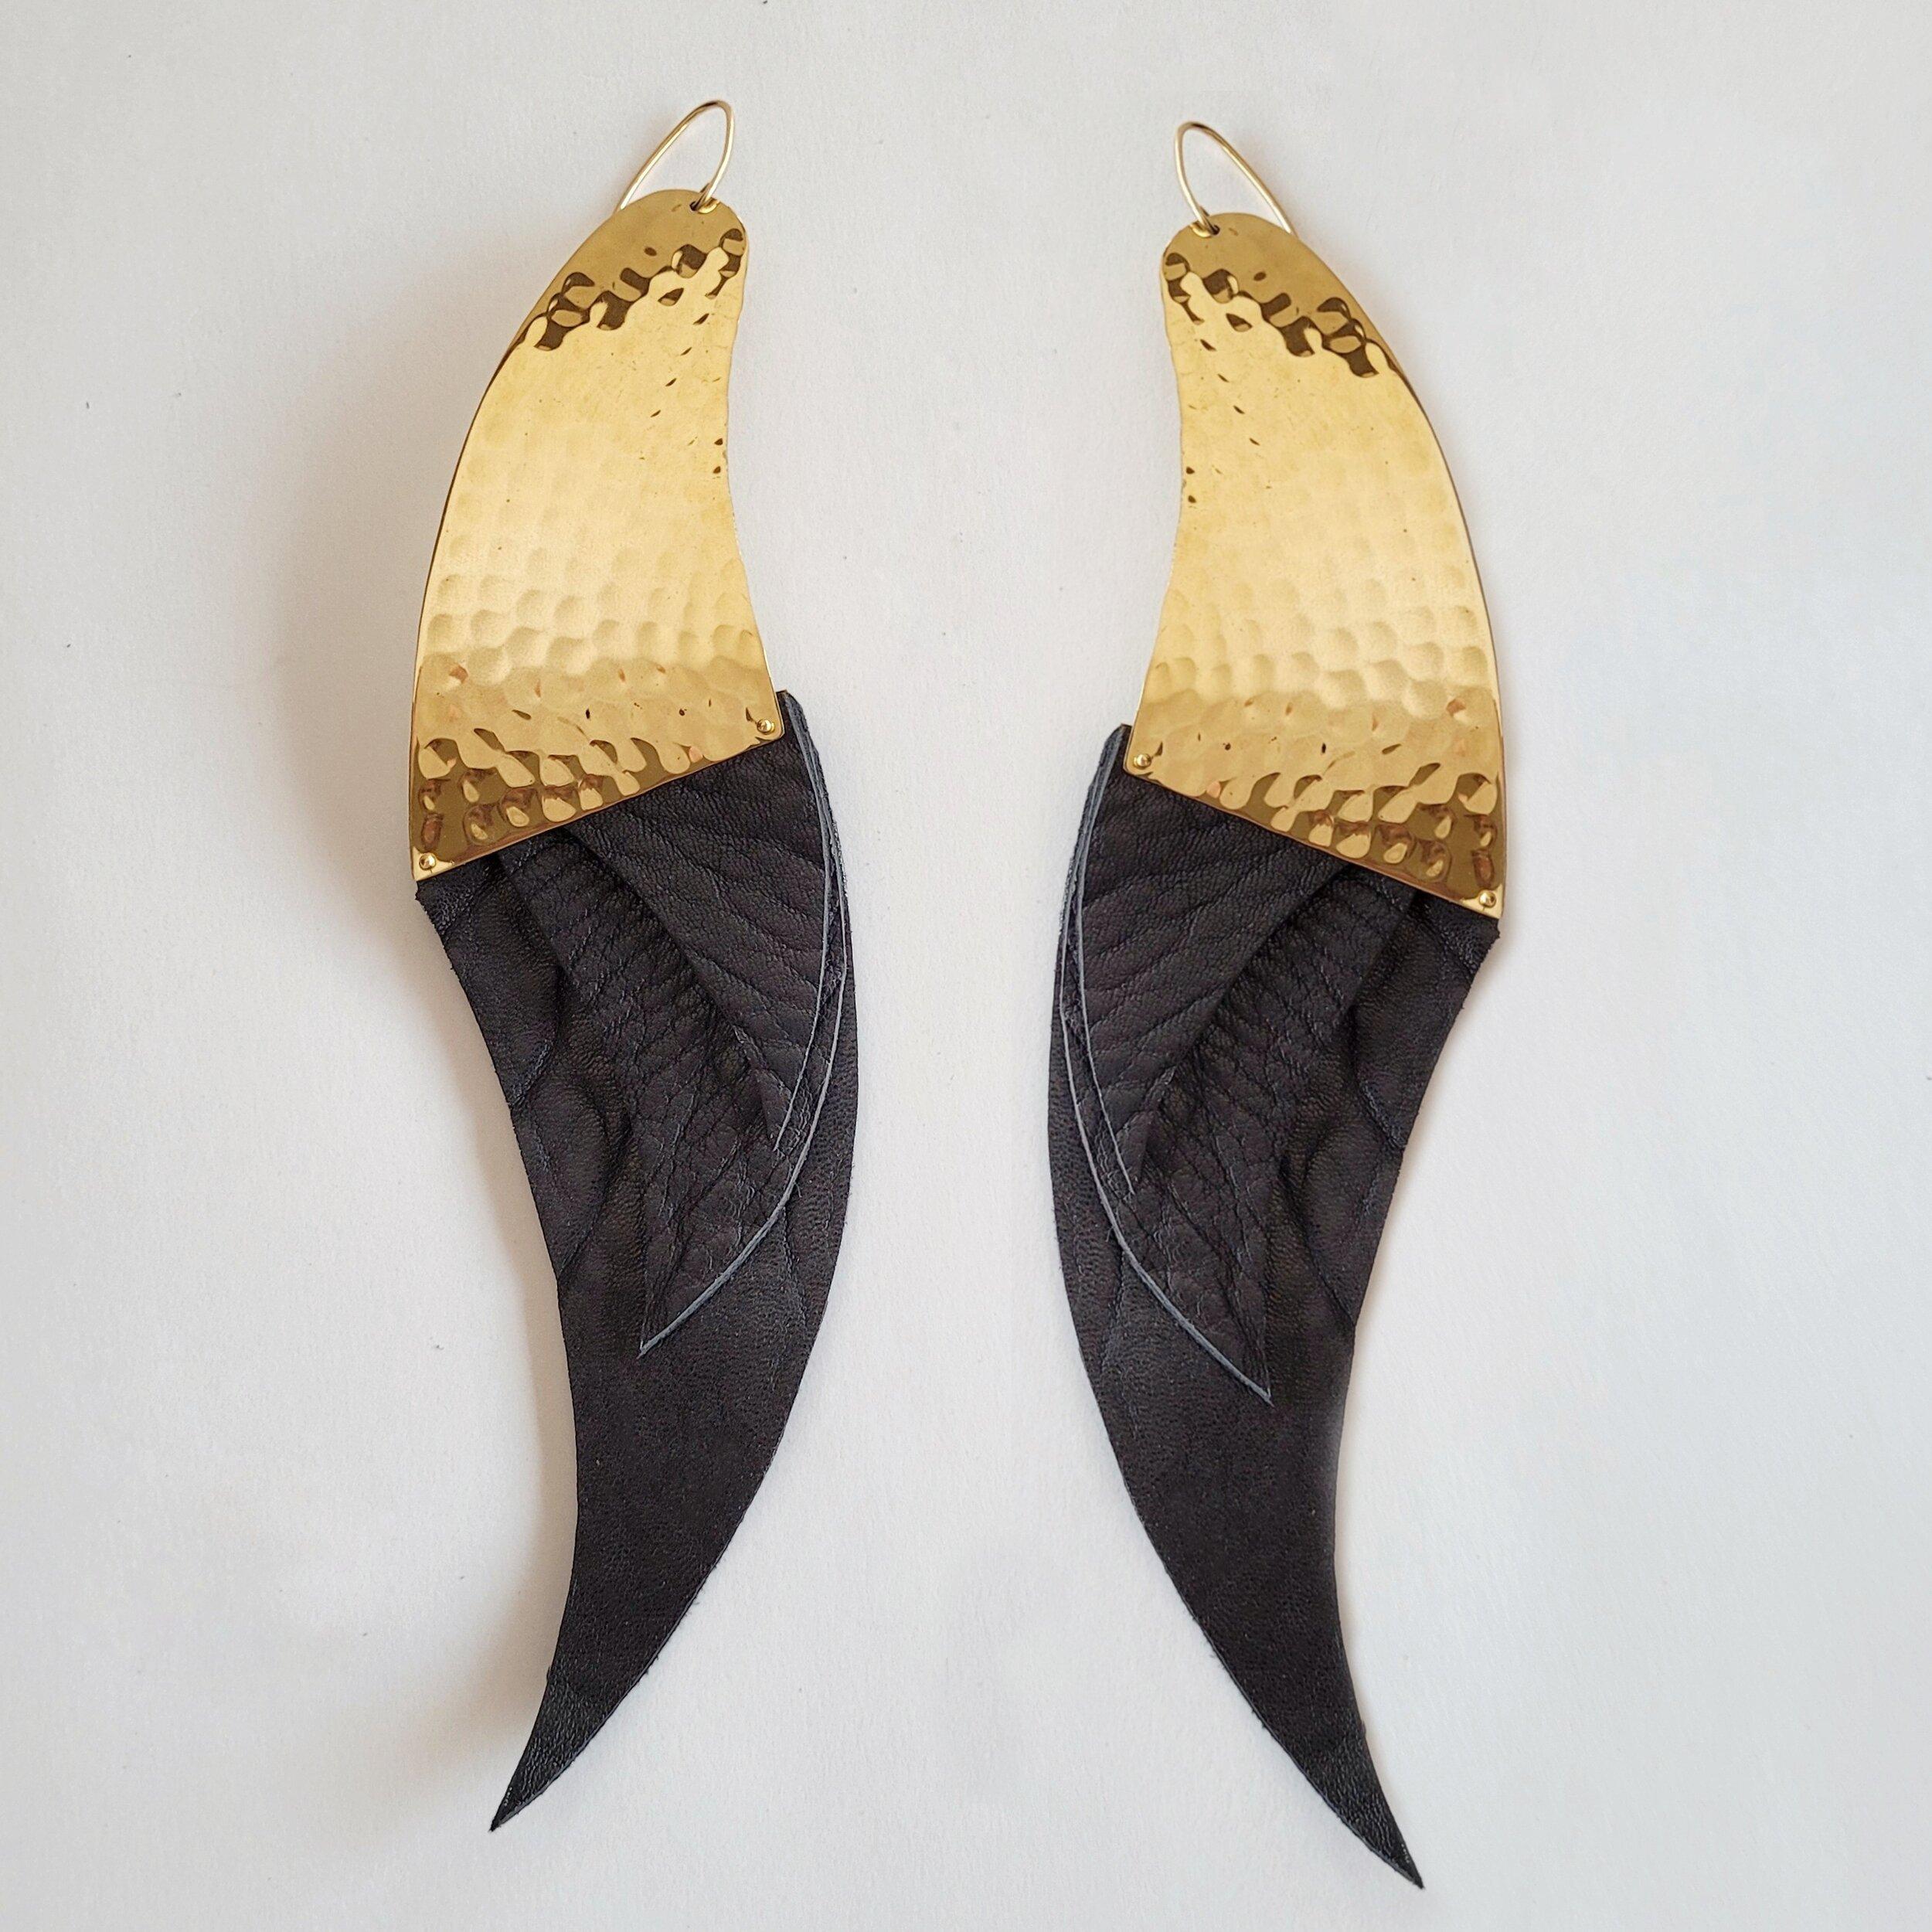 Long leather brass handmade XL starling earrings